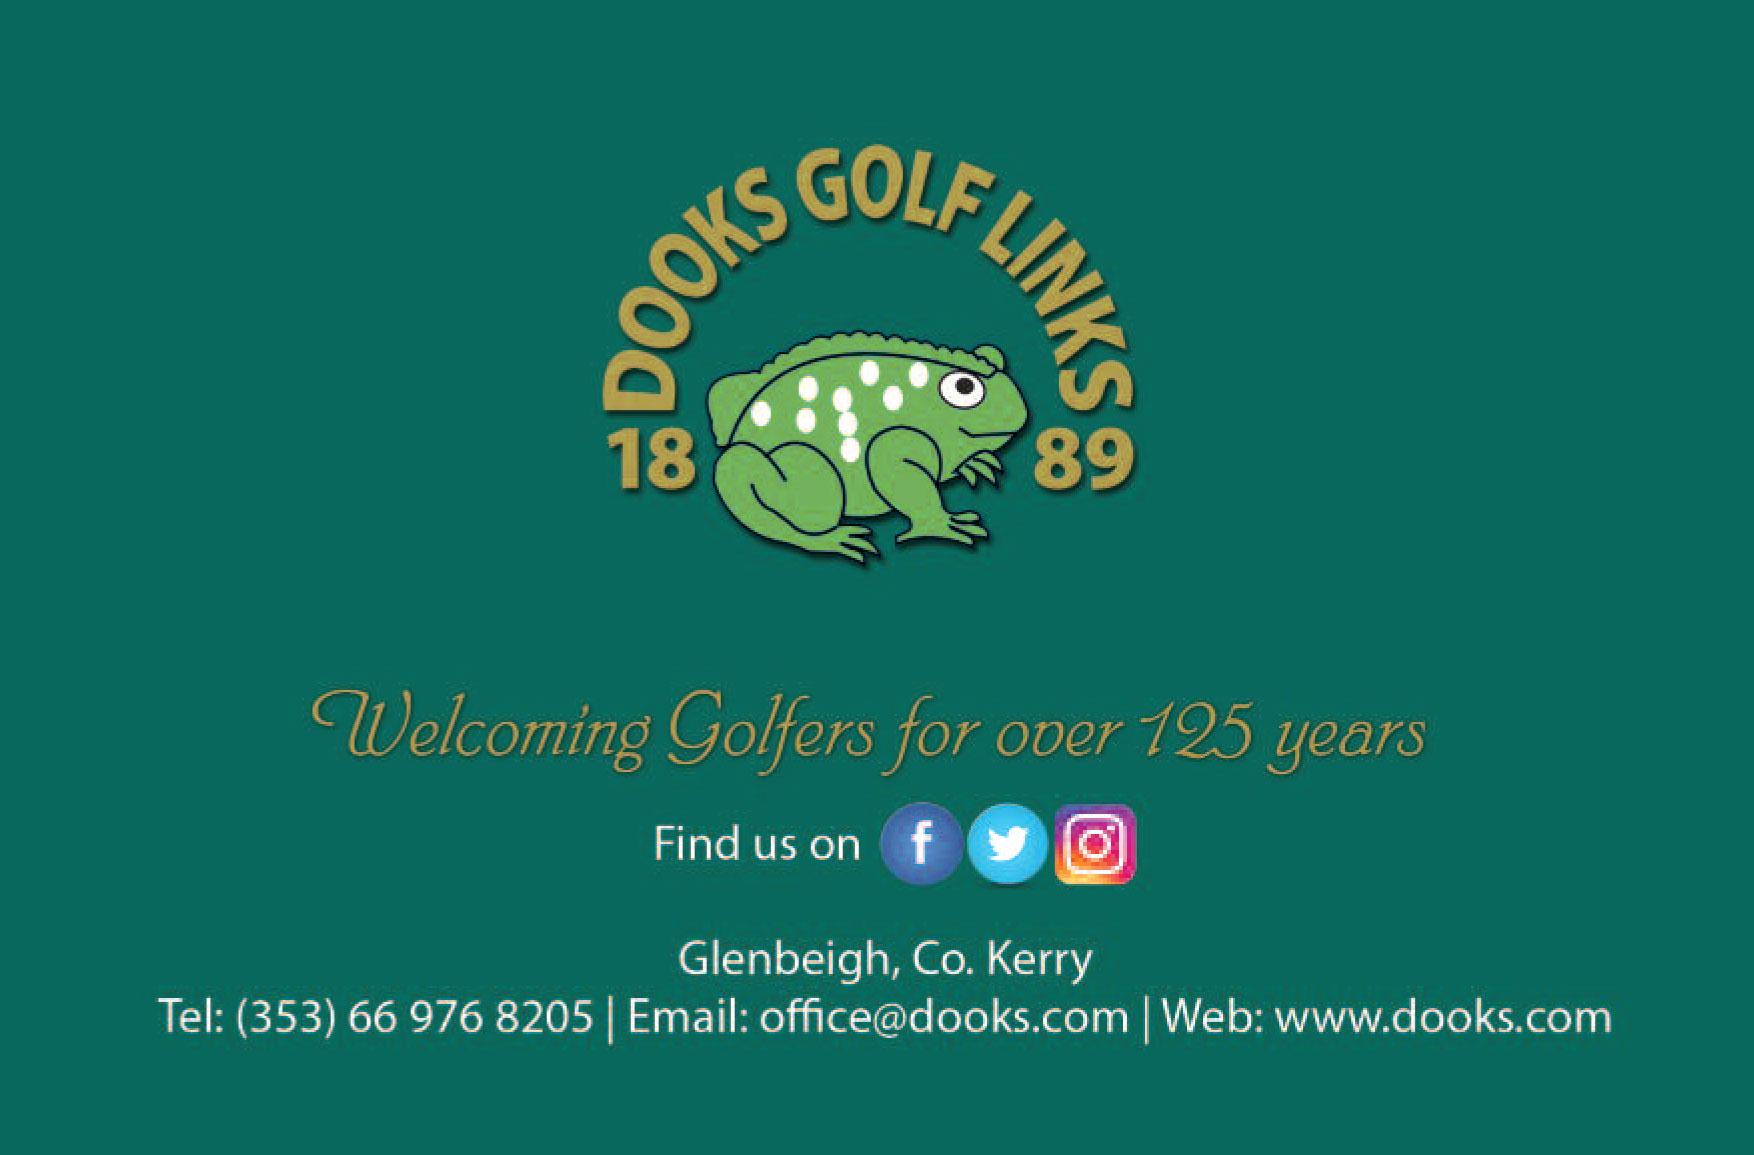 dooks golf links scorecard